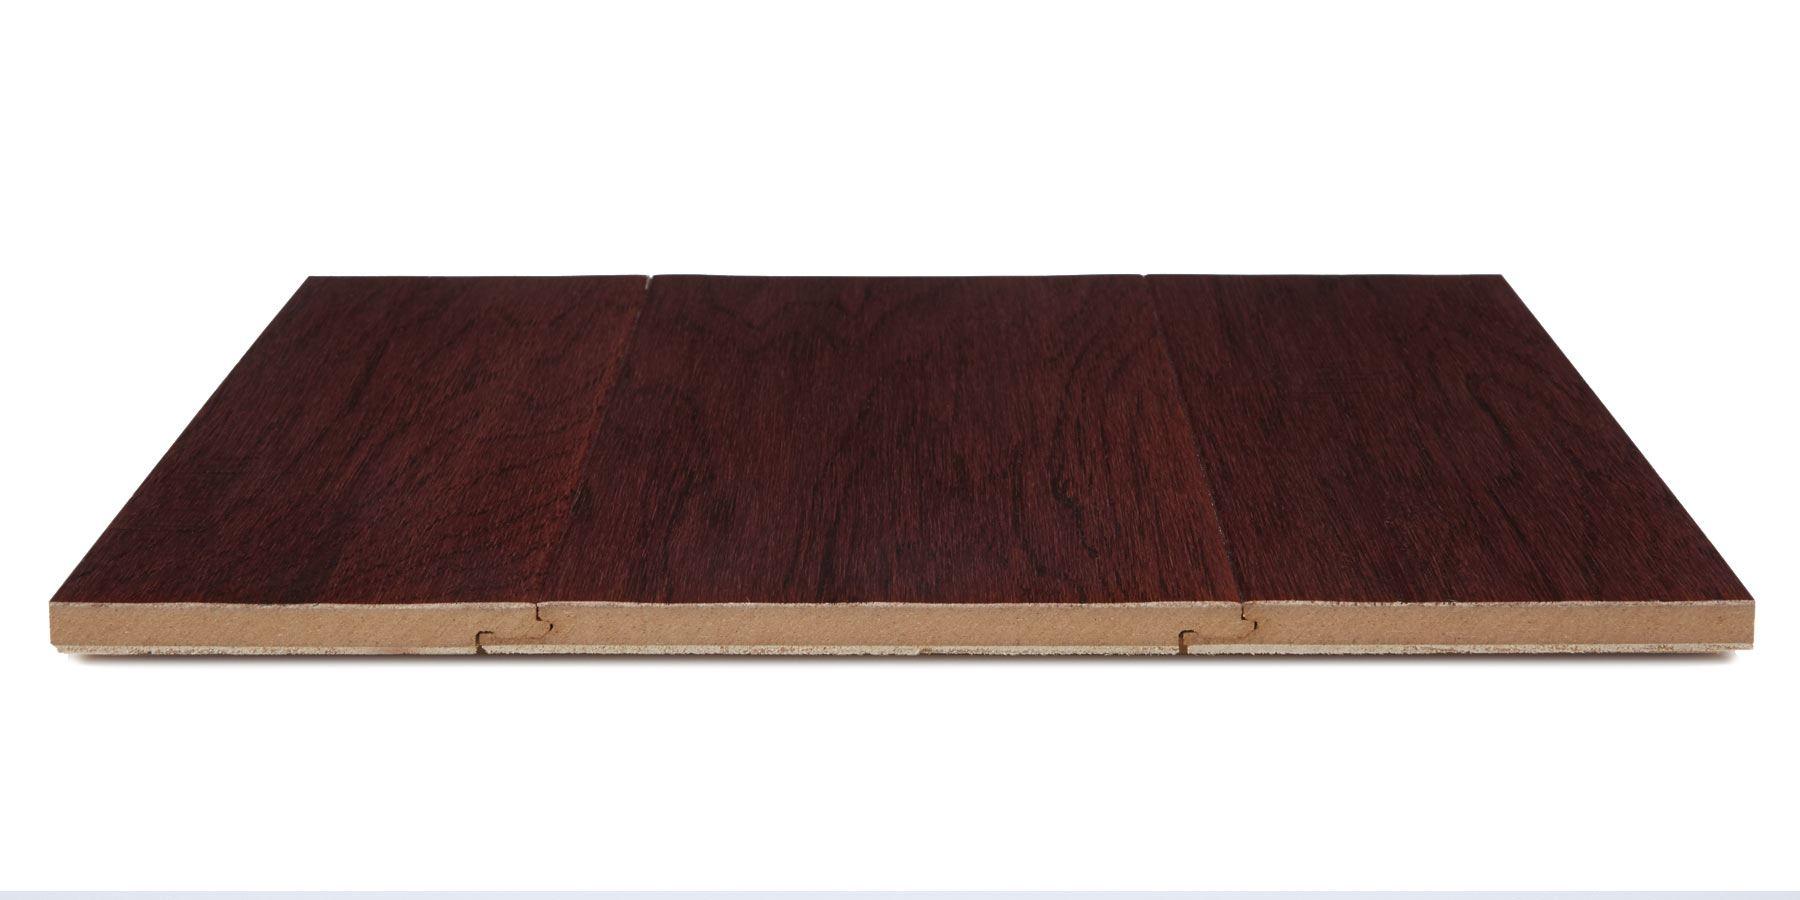 Cambridge Chestnut Hardwood